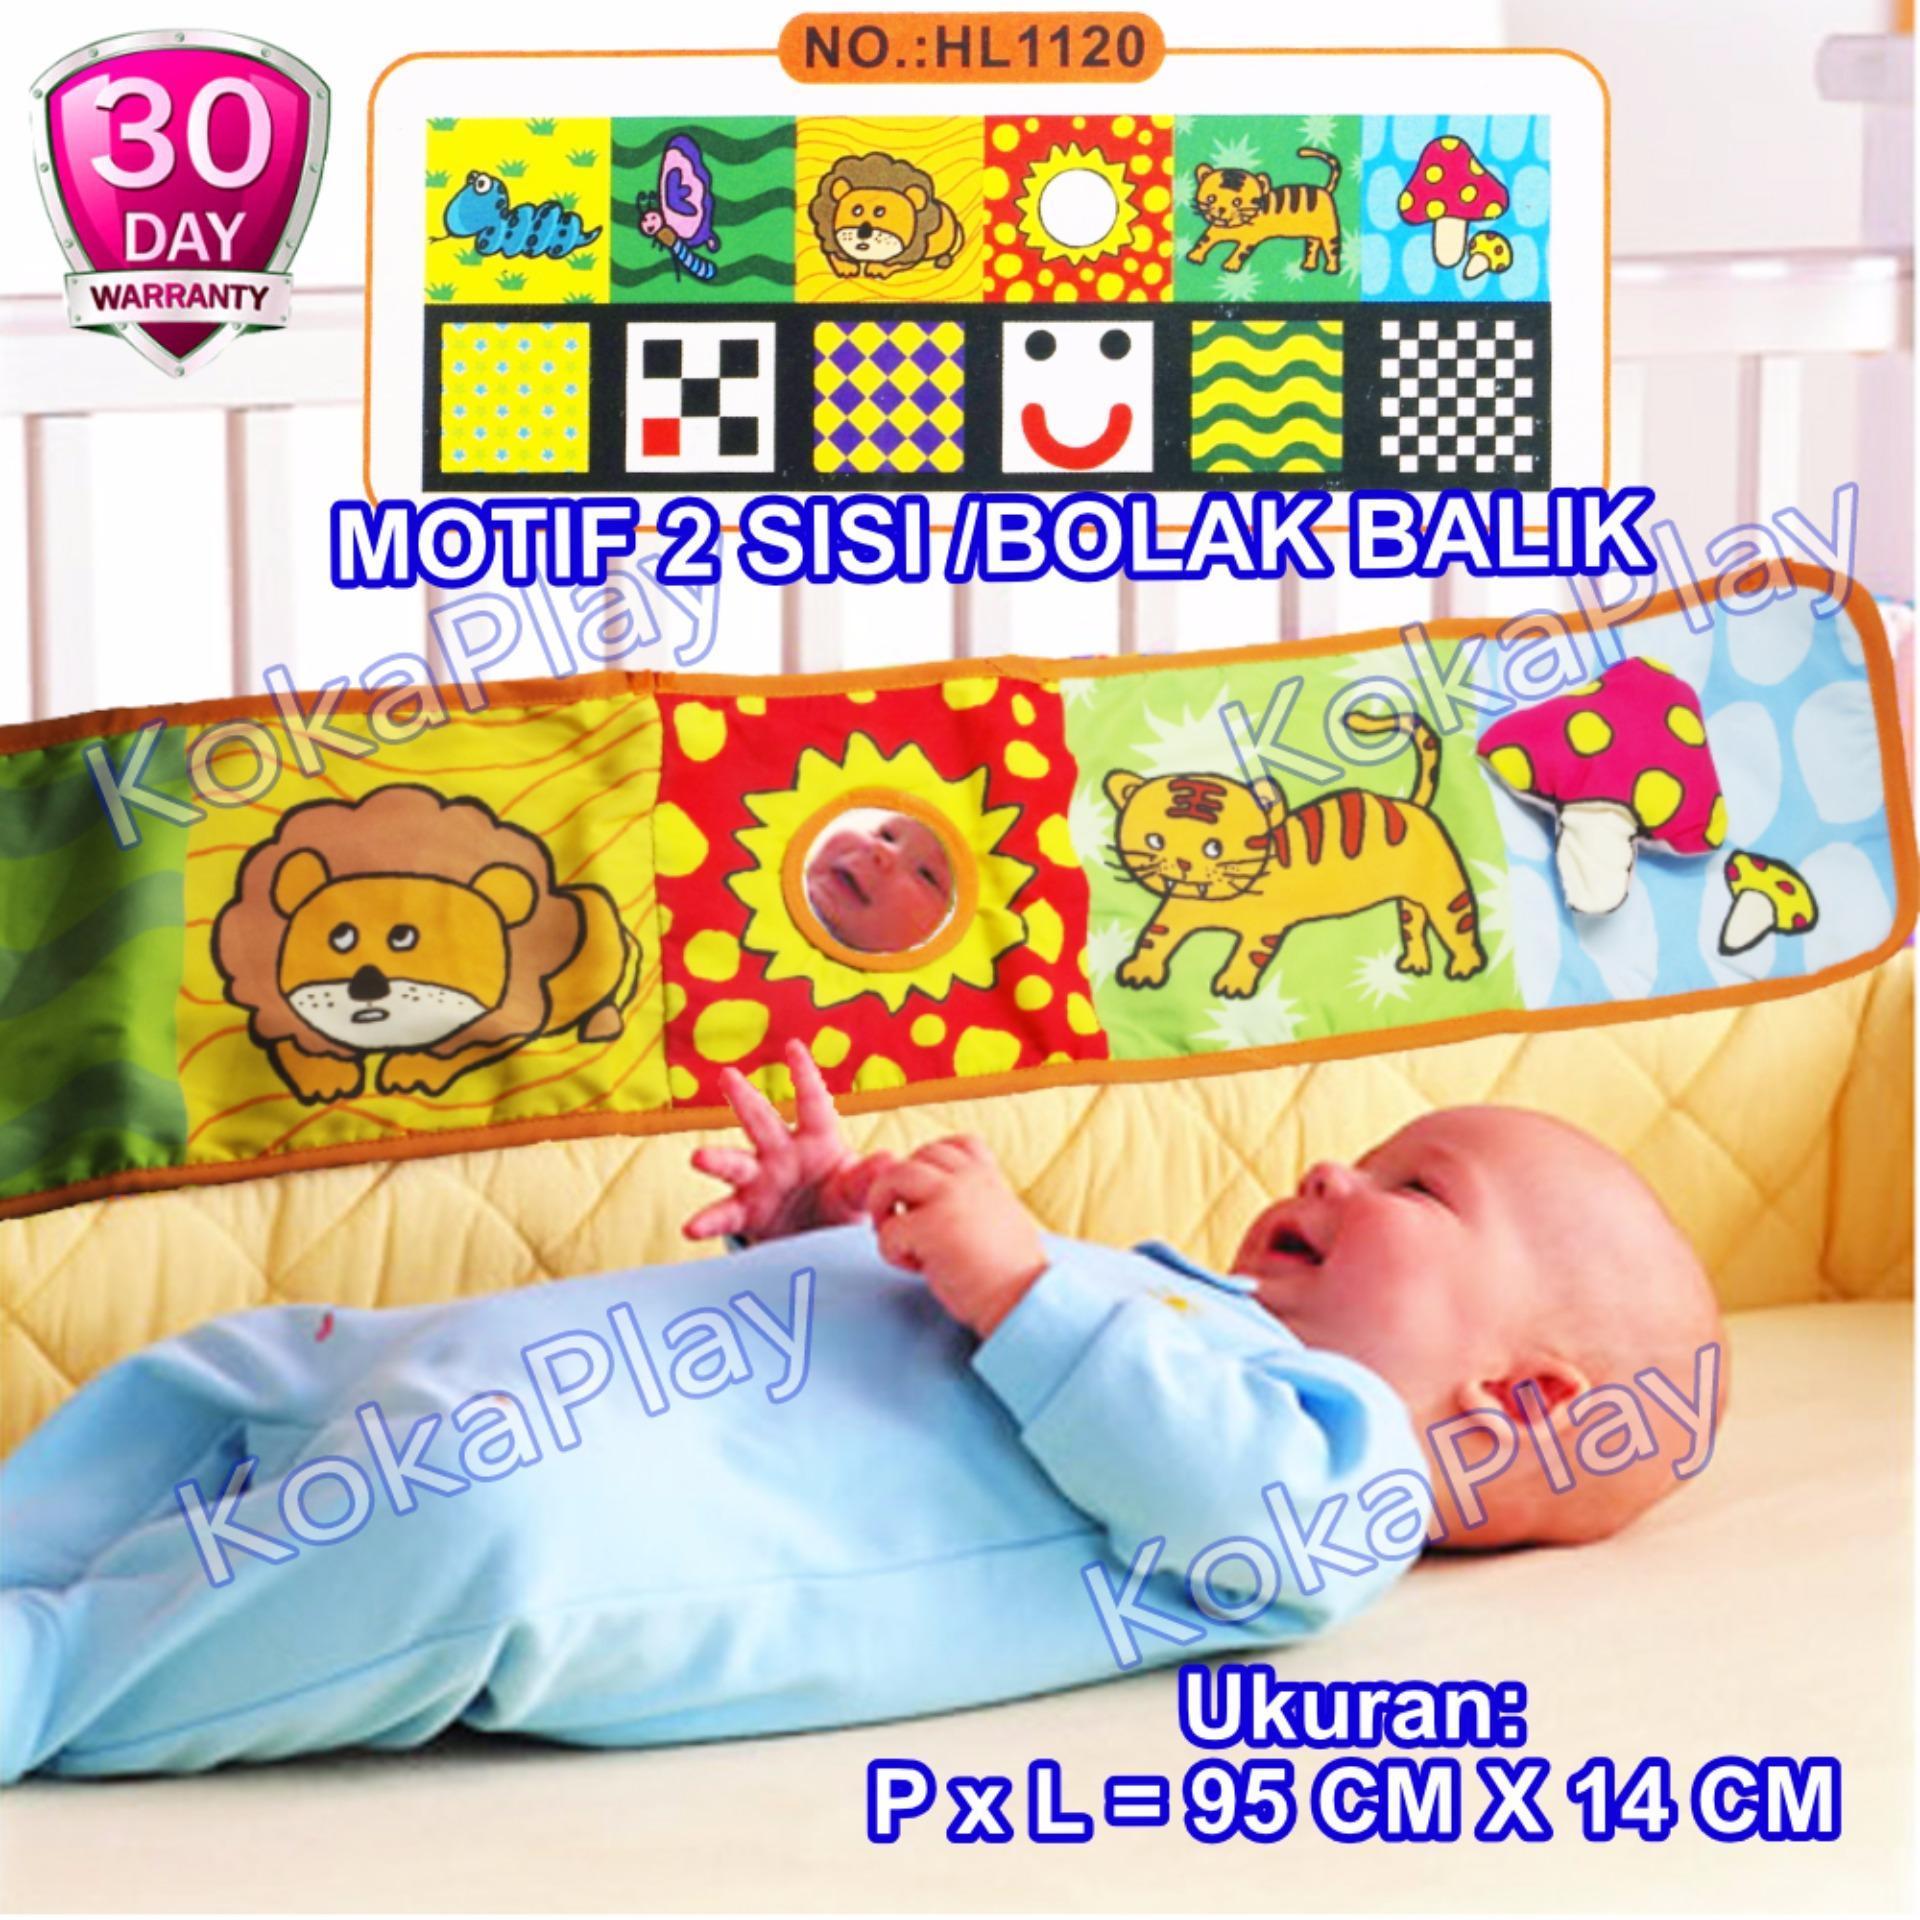 KokaPlay Baby Cloth Soft Book 6 in 1 for Crib Mainan Anak Bayi Buku Cerita Ranjang Bayi Kain Hewan Tumbuhan - Motif Jamur